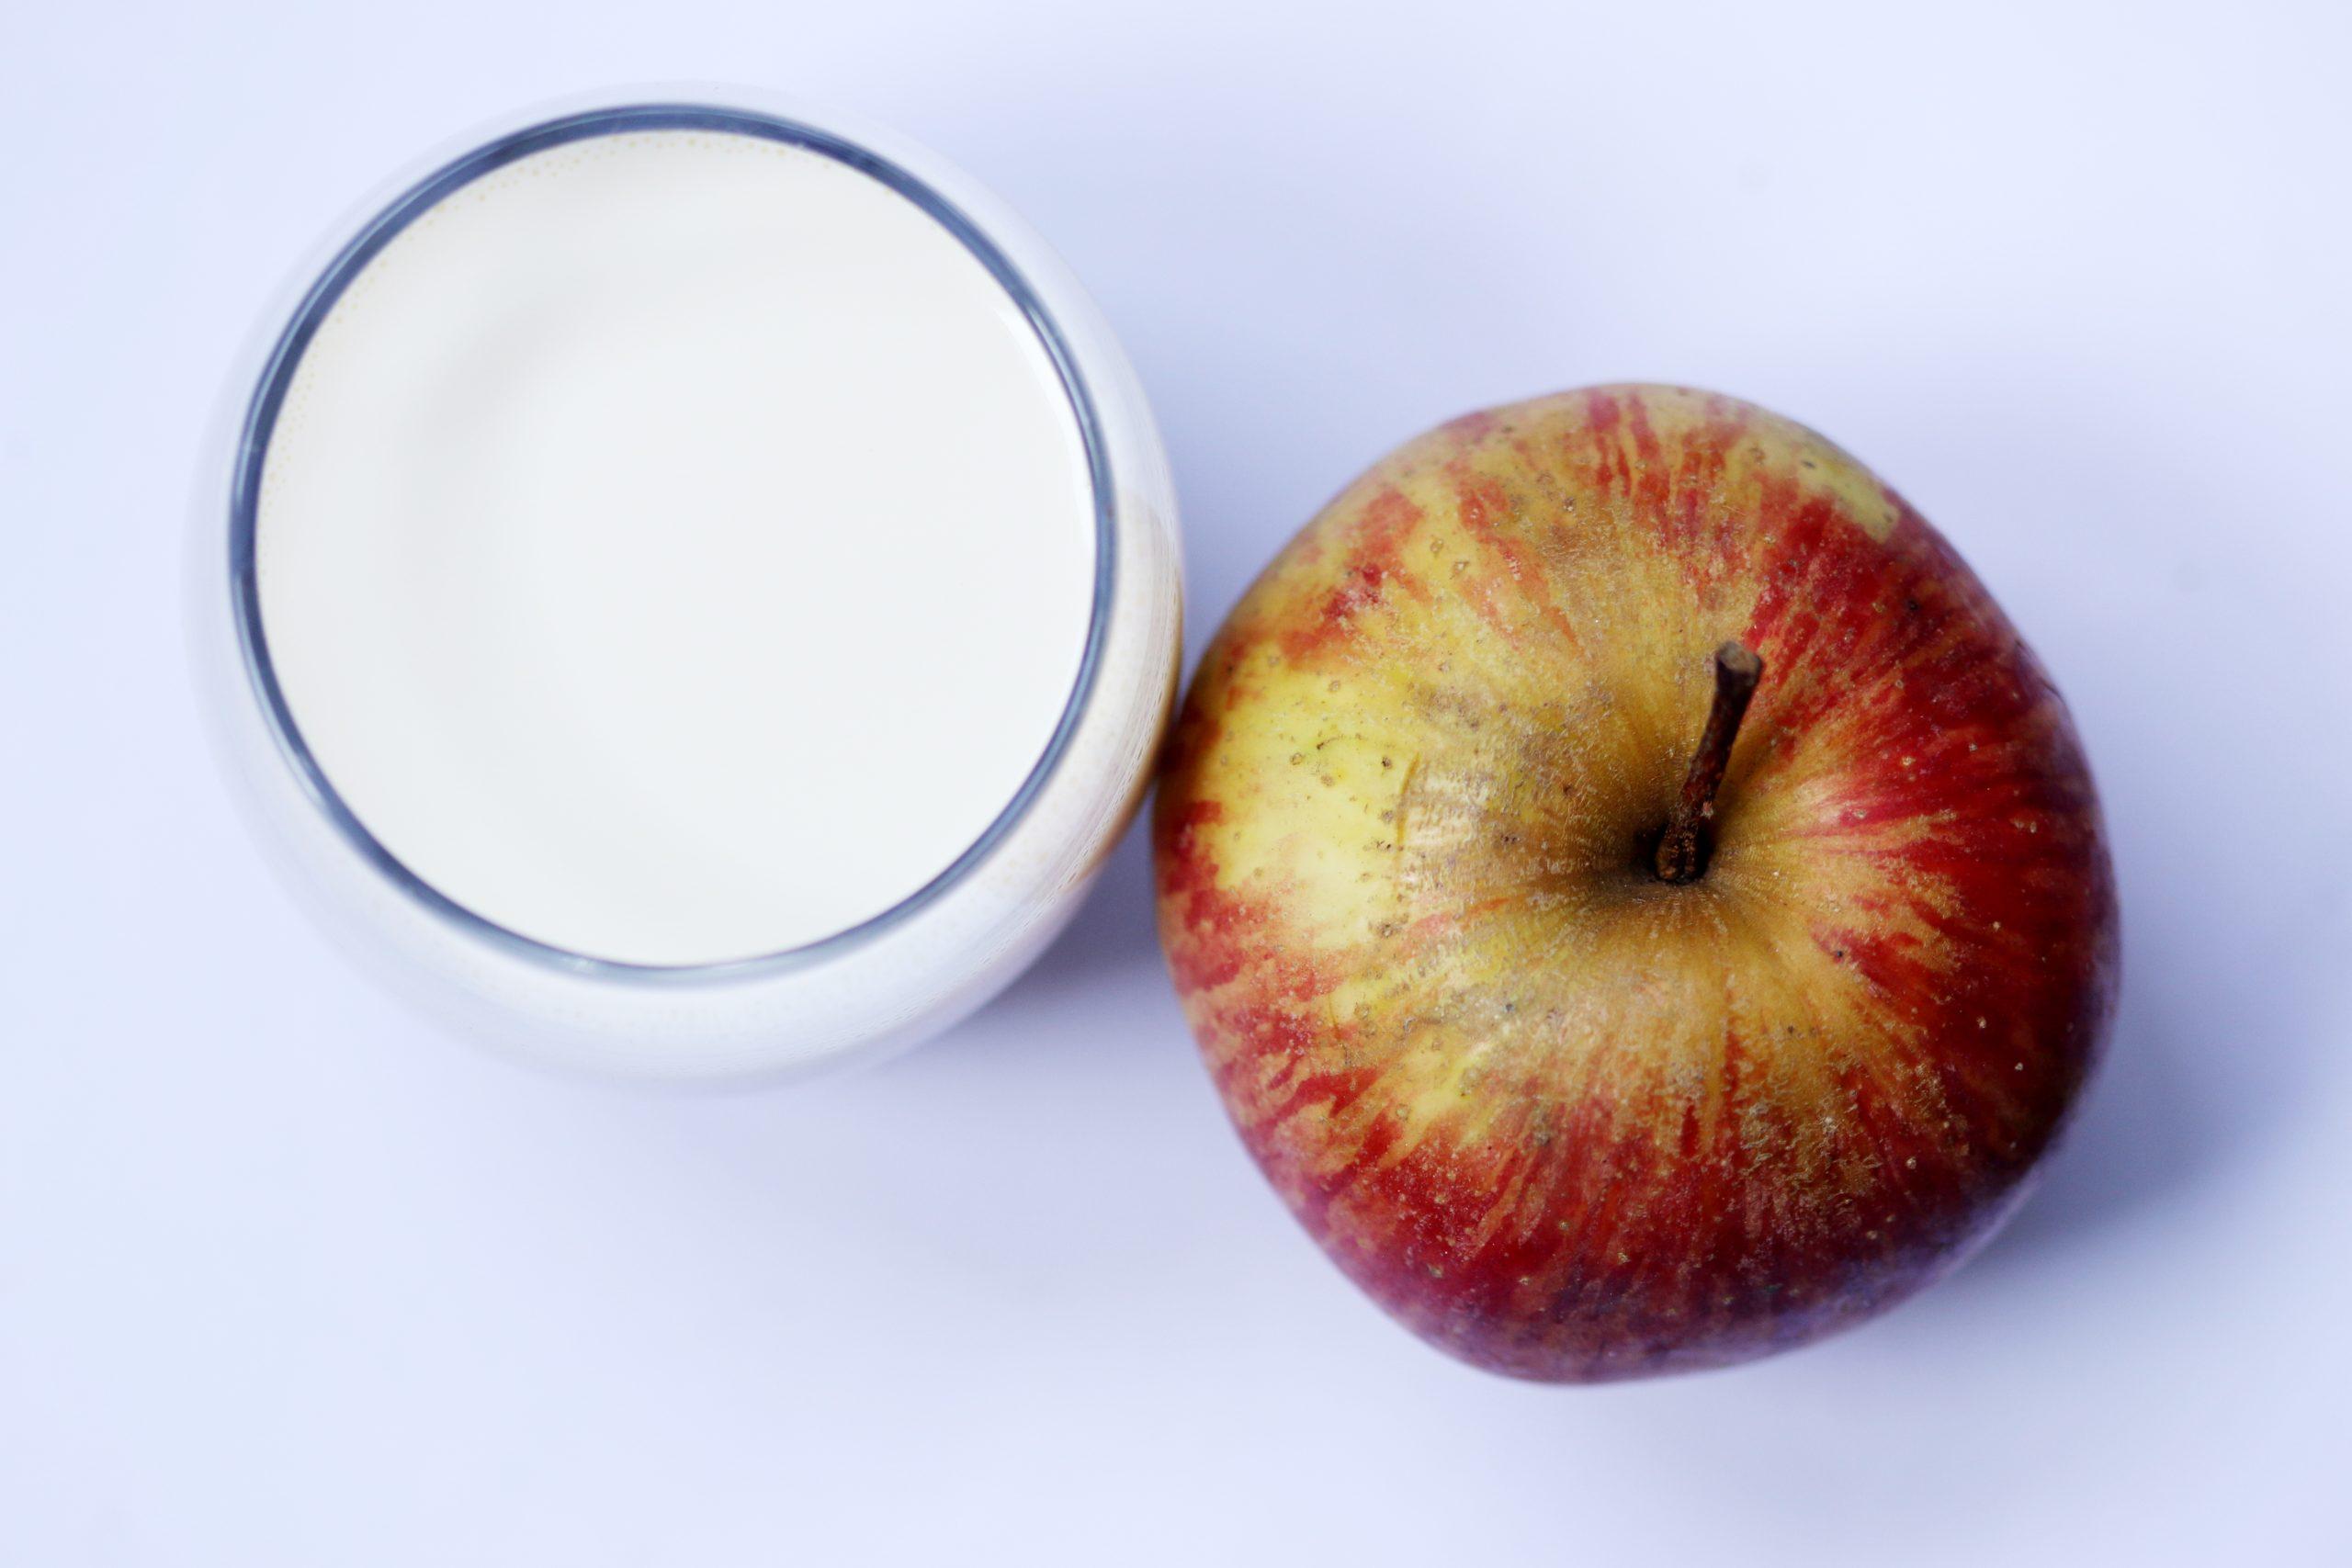 Apple and milk glass